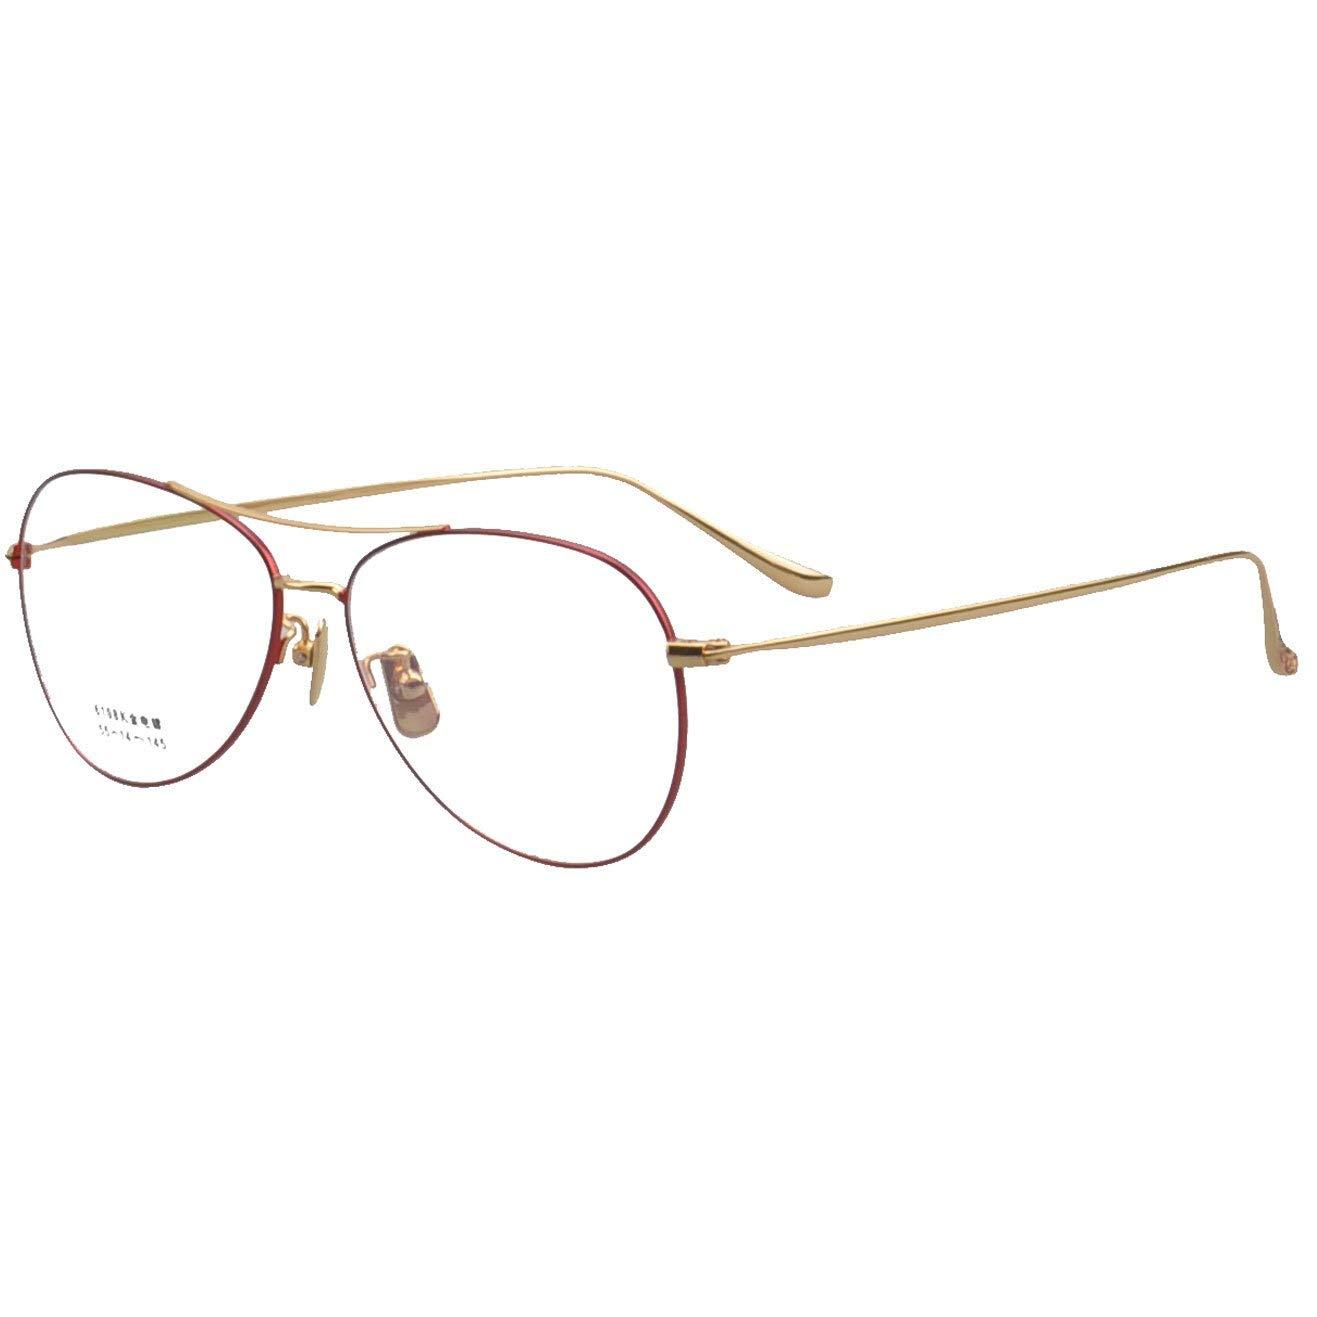 73abde3f8849b Get Quotations · 6108 Unisex Metal Eyeglasses Prescription Spectacles  Optical Frames